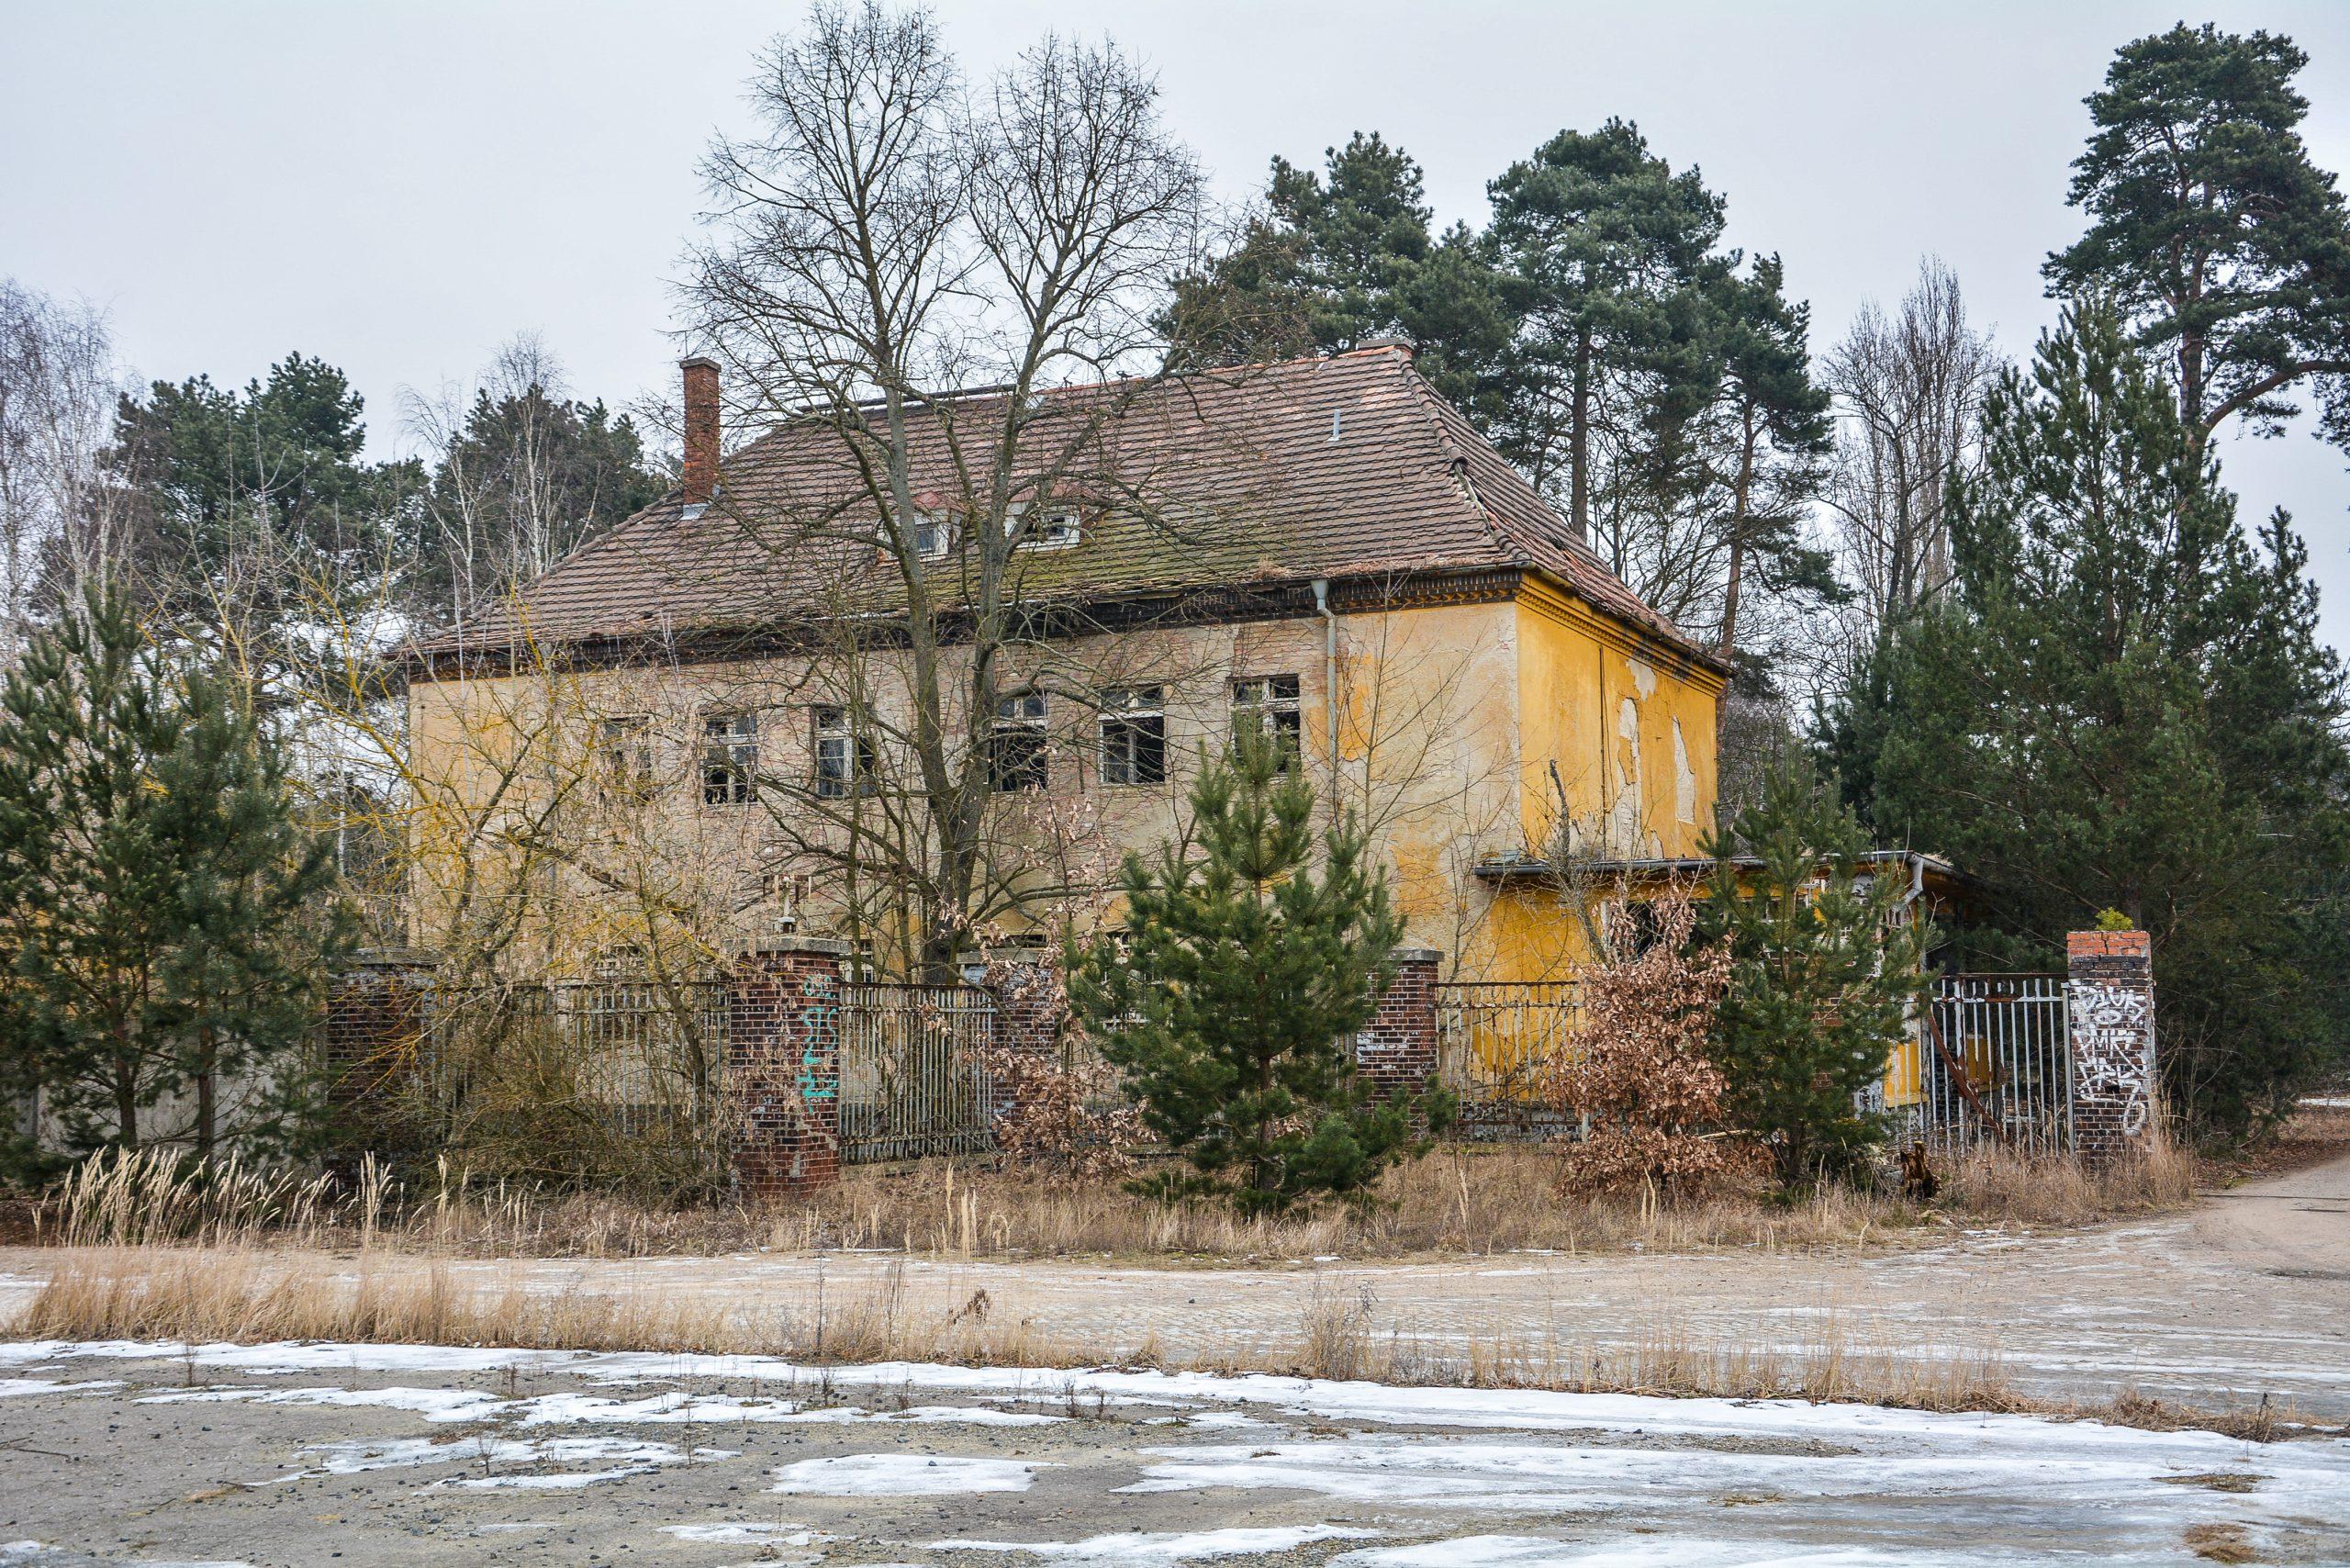 wachhaus guard house forst zinna adolf hitler lager luckenwalde juterbog sowjet kaserne soviet military barracks germany lost places urbex abandoned